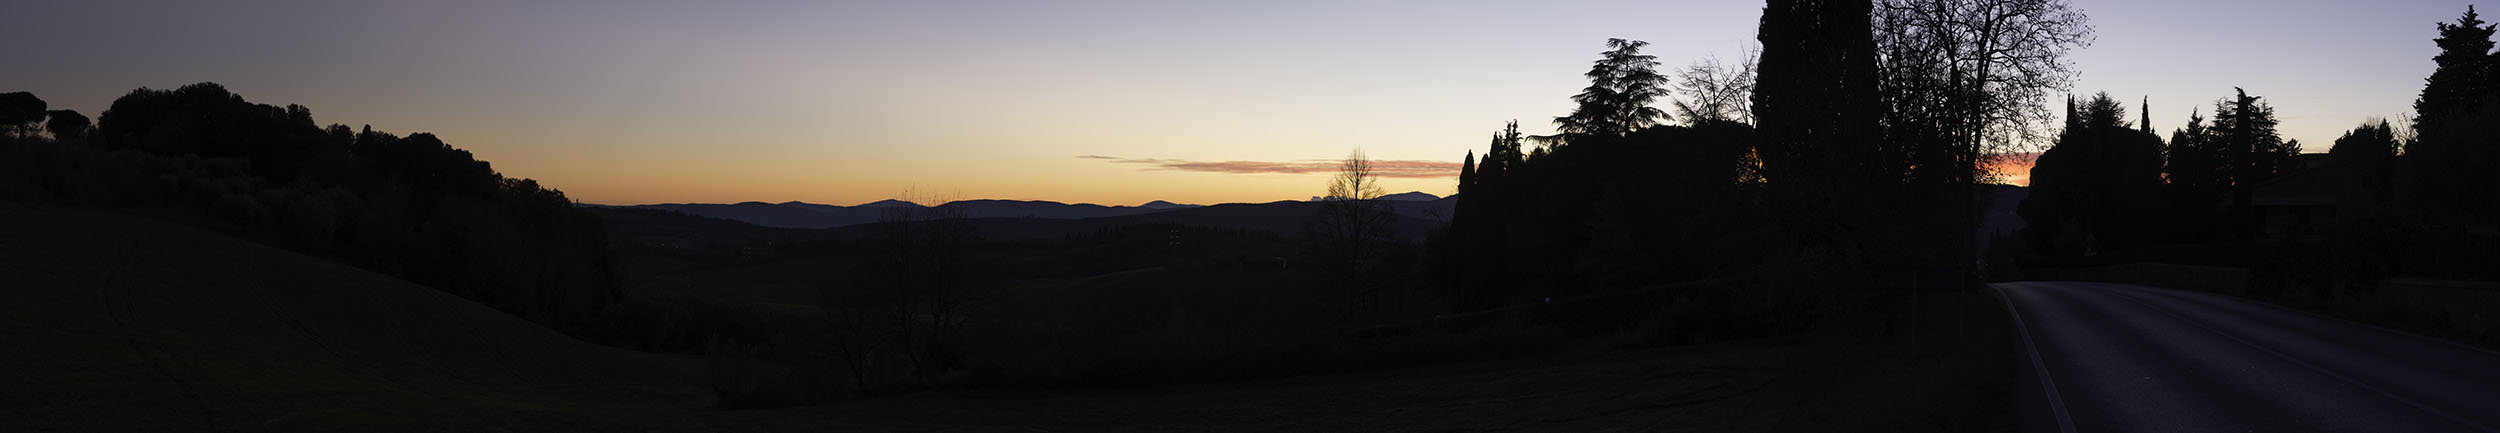 TwiLight, Pian del Lago to Siena 12-26-2014-5273-5283